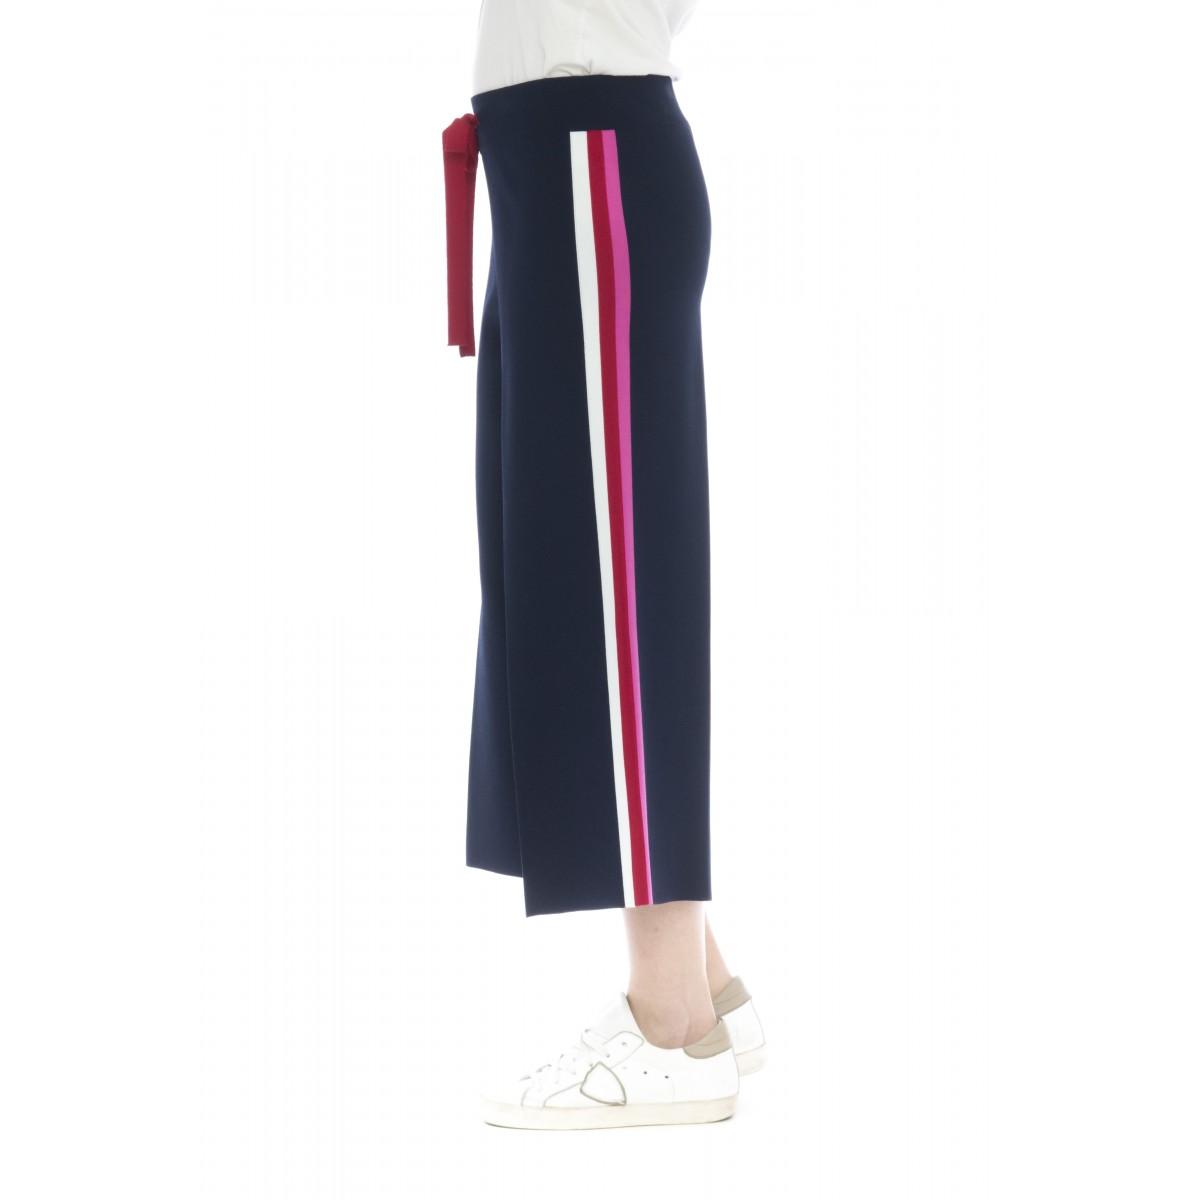 Pantalone donna - Novia pantalone maglia banda